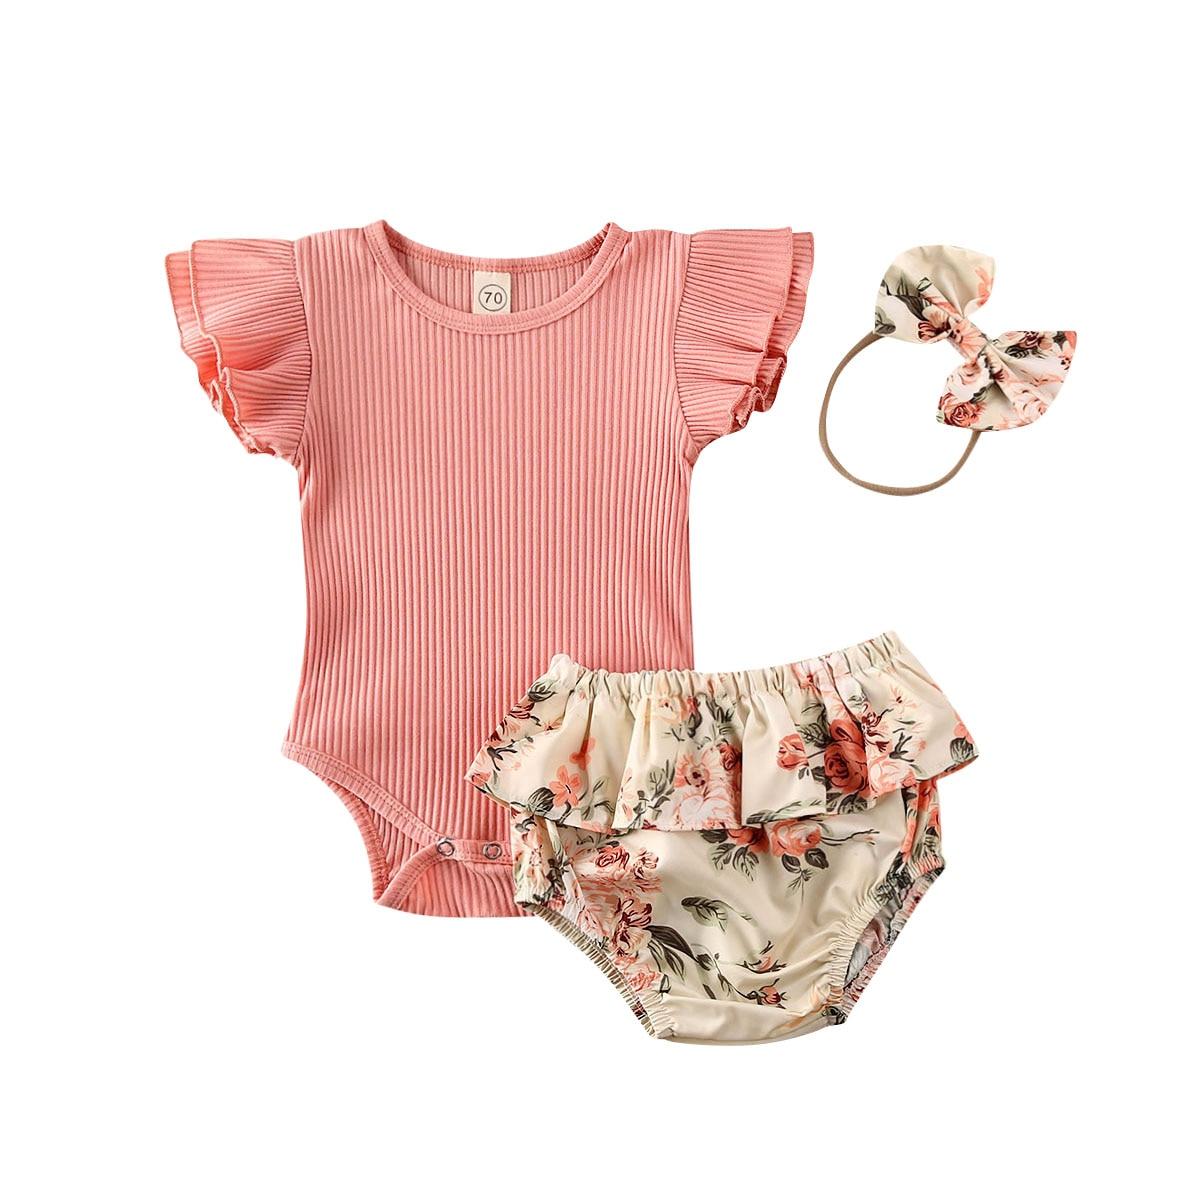 Baby Summer Clothes Infant Newborn Baby Girl Ruffled Ribbed Bodysuit Floral Shorts Headband 3Pcs Set